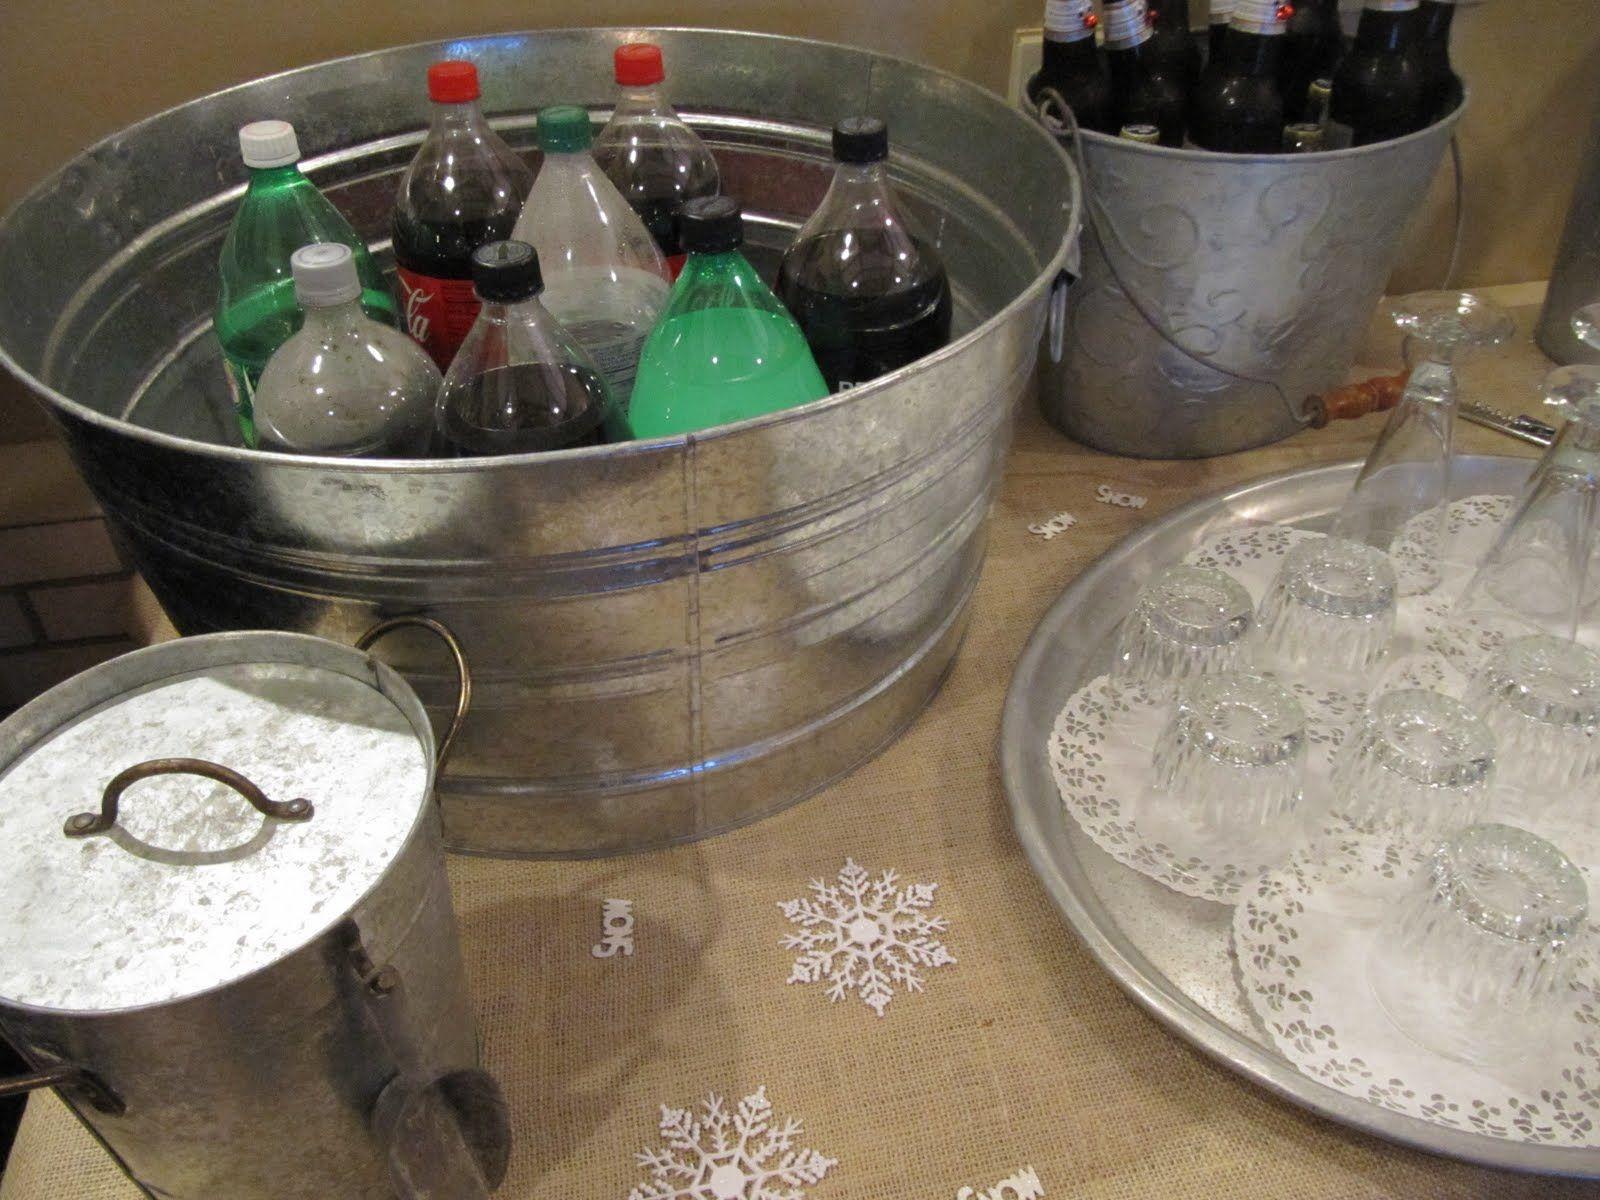 Soda bottles in galvanised tub